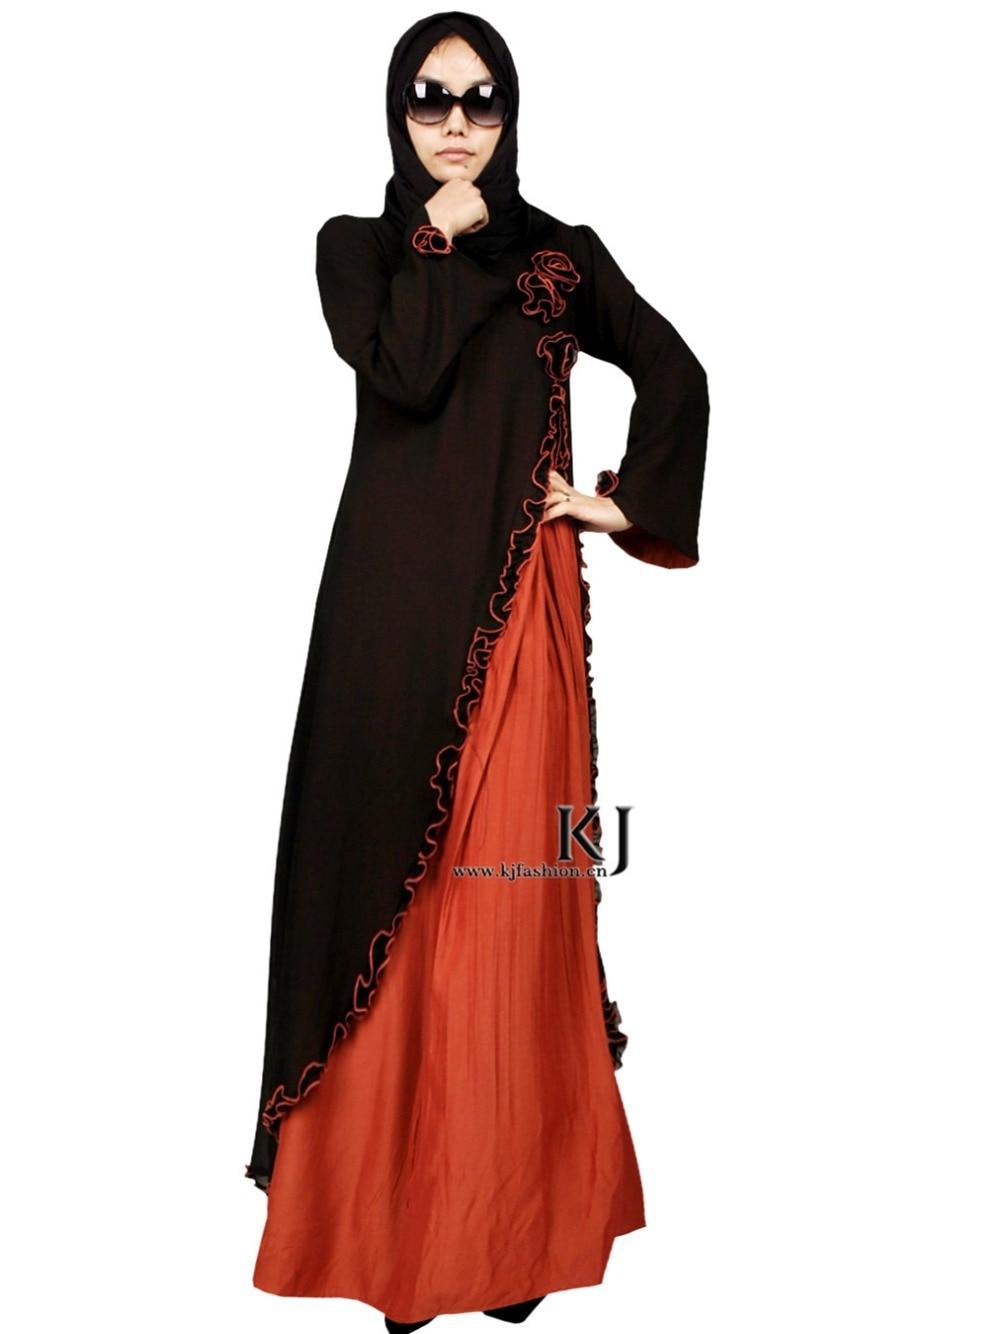 Dubai online shopping clothes cheap